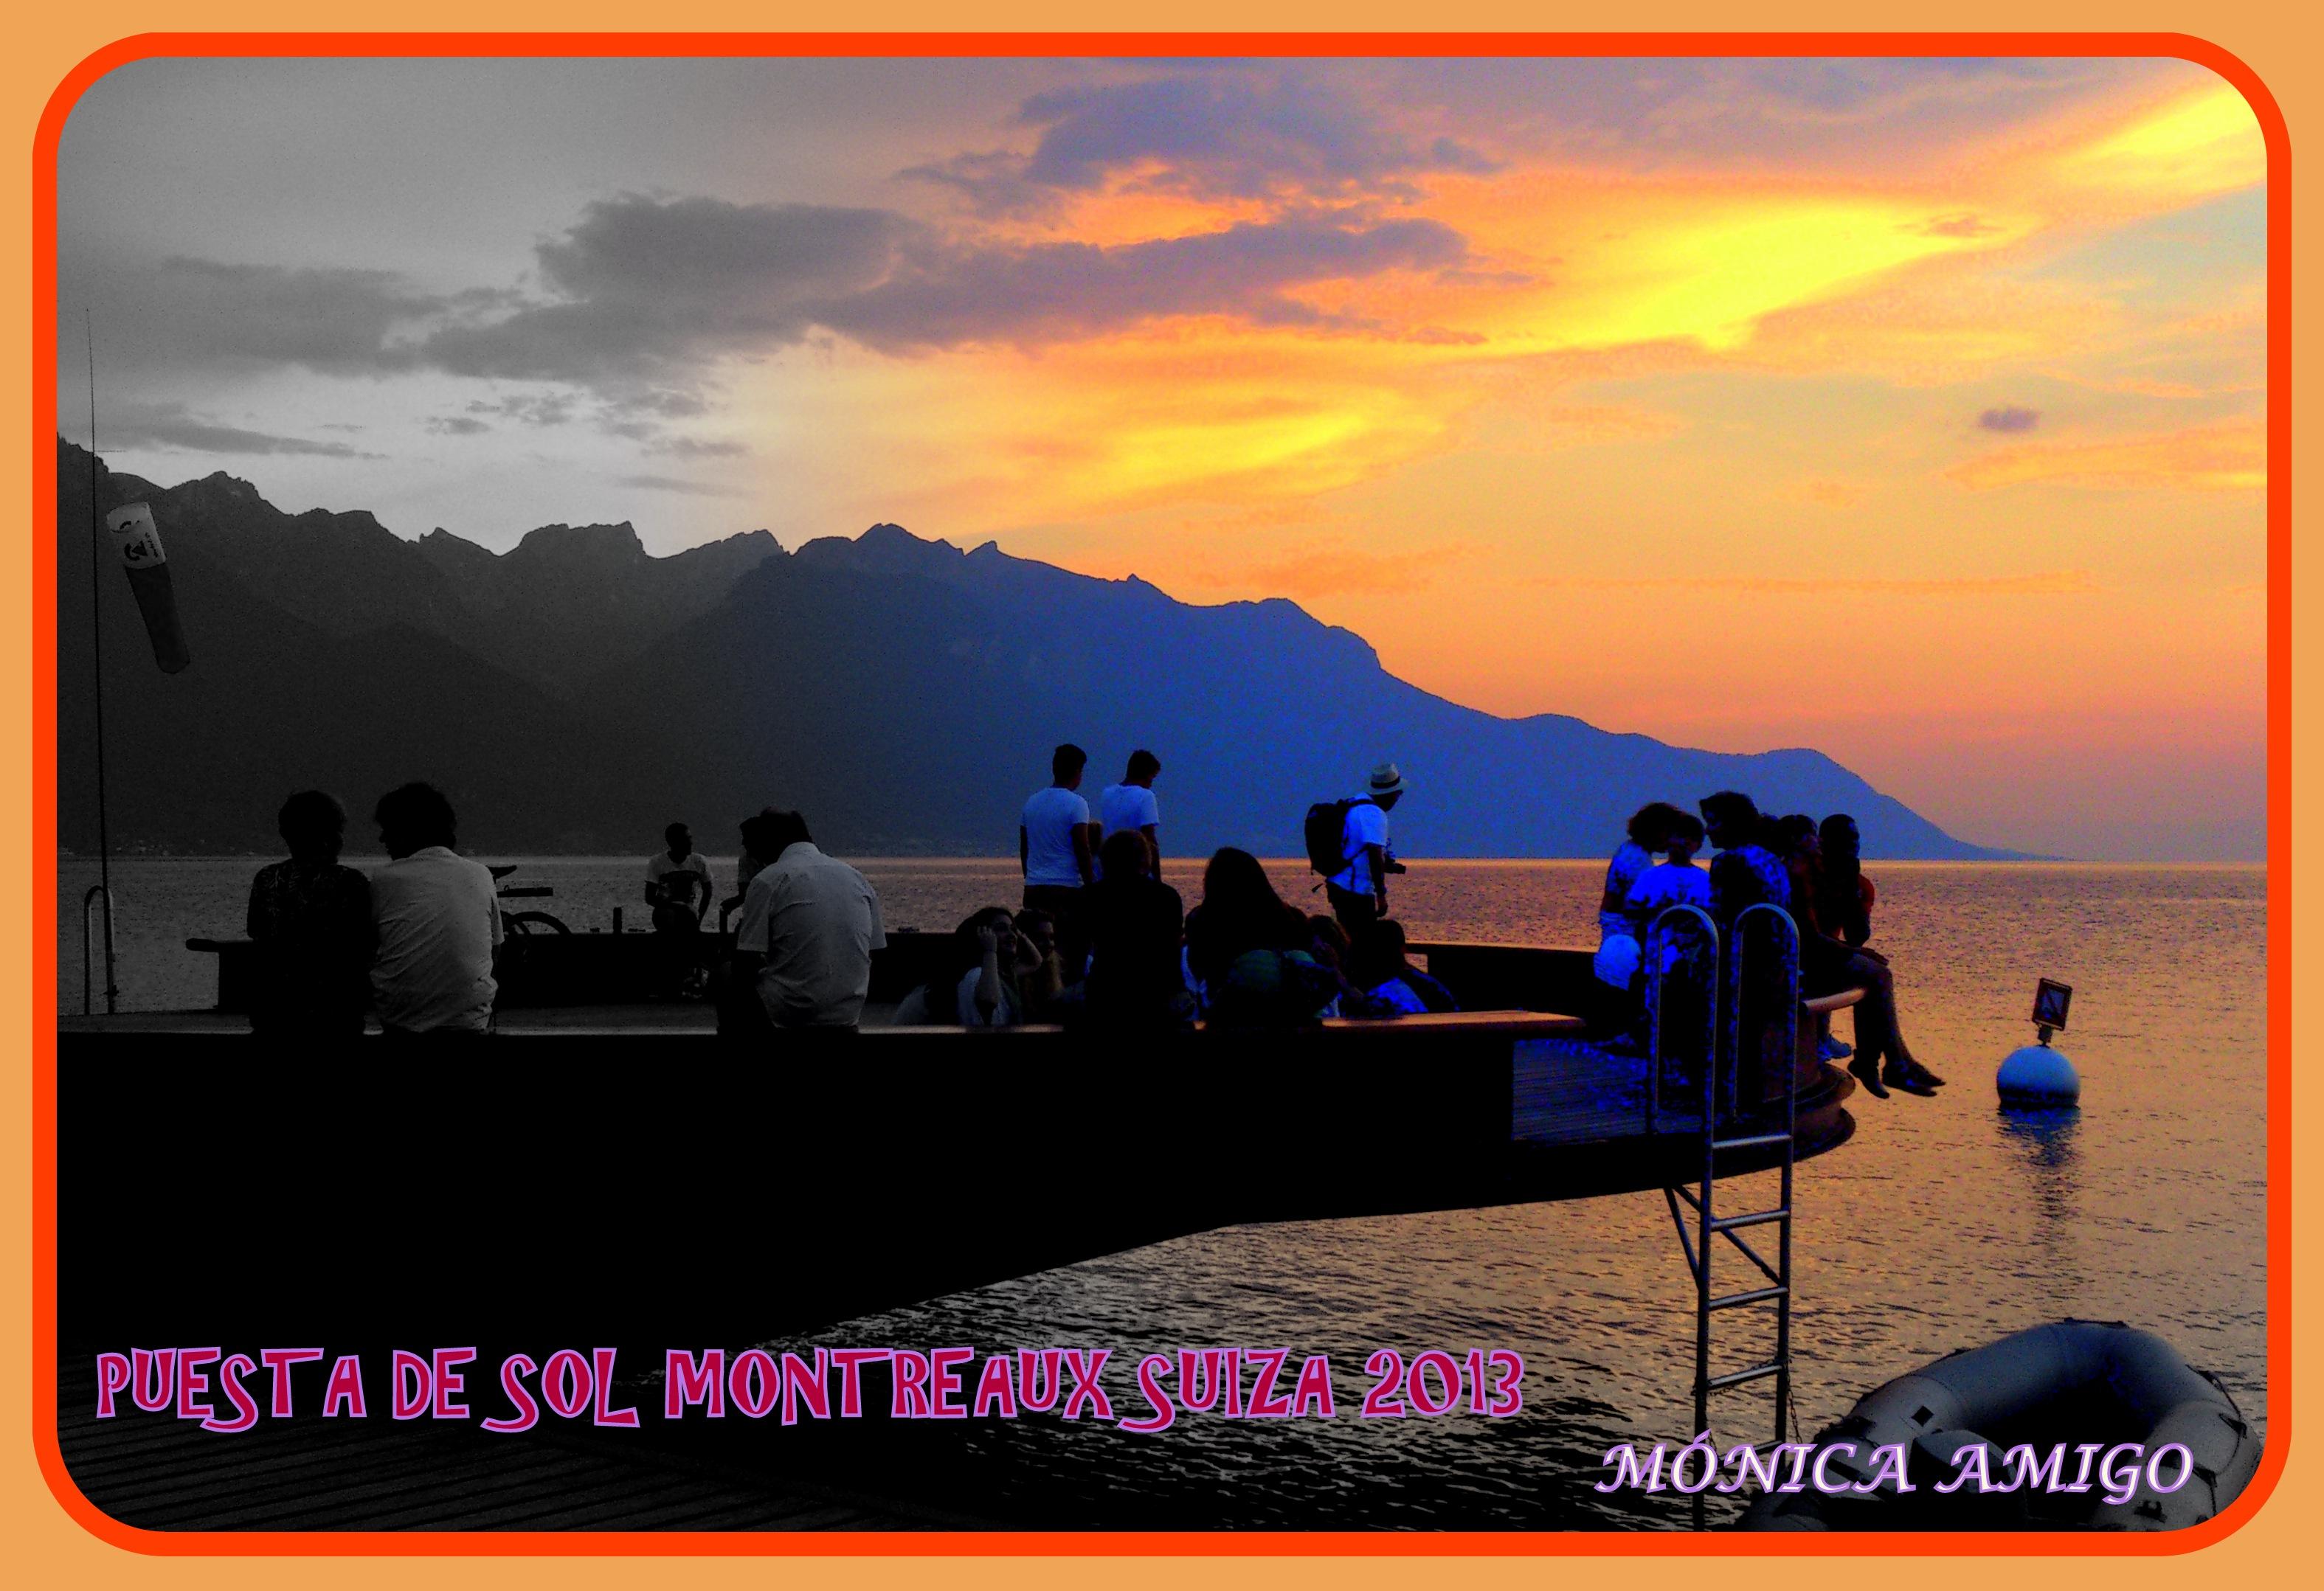 Puesta de sol en Montreaux Suiza 2013